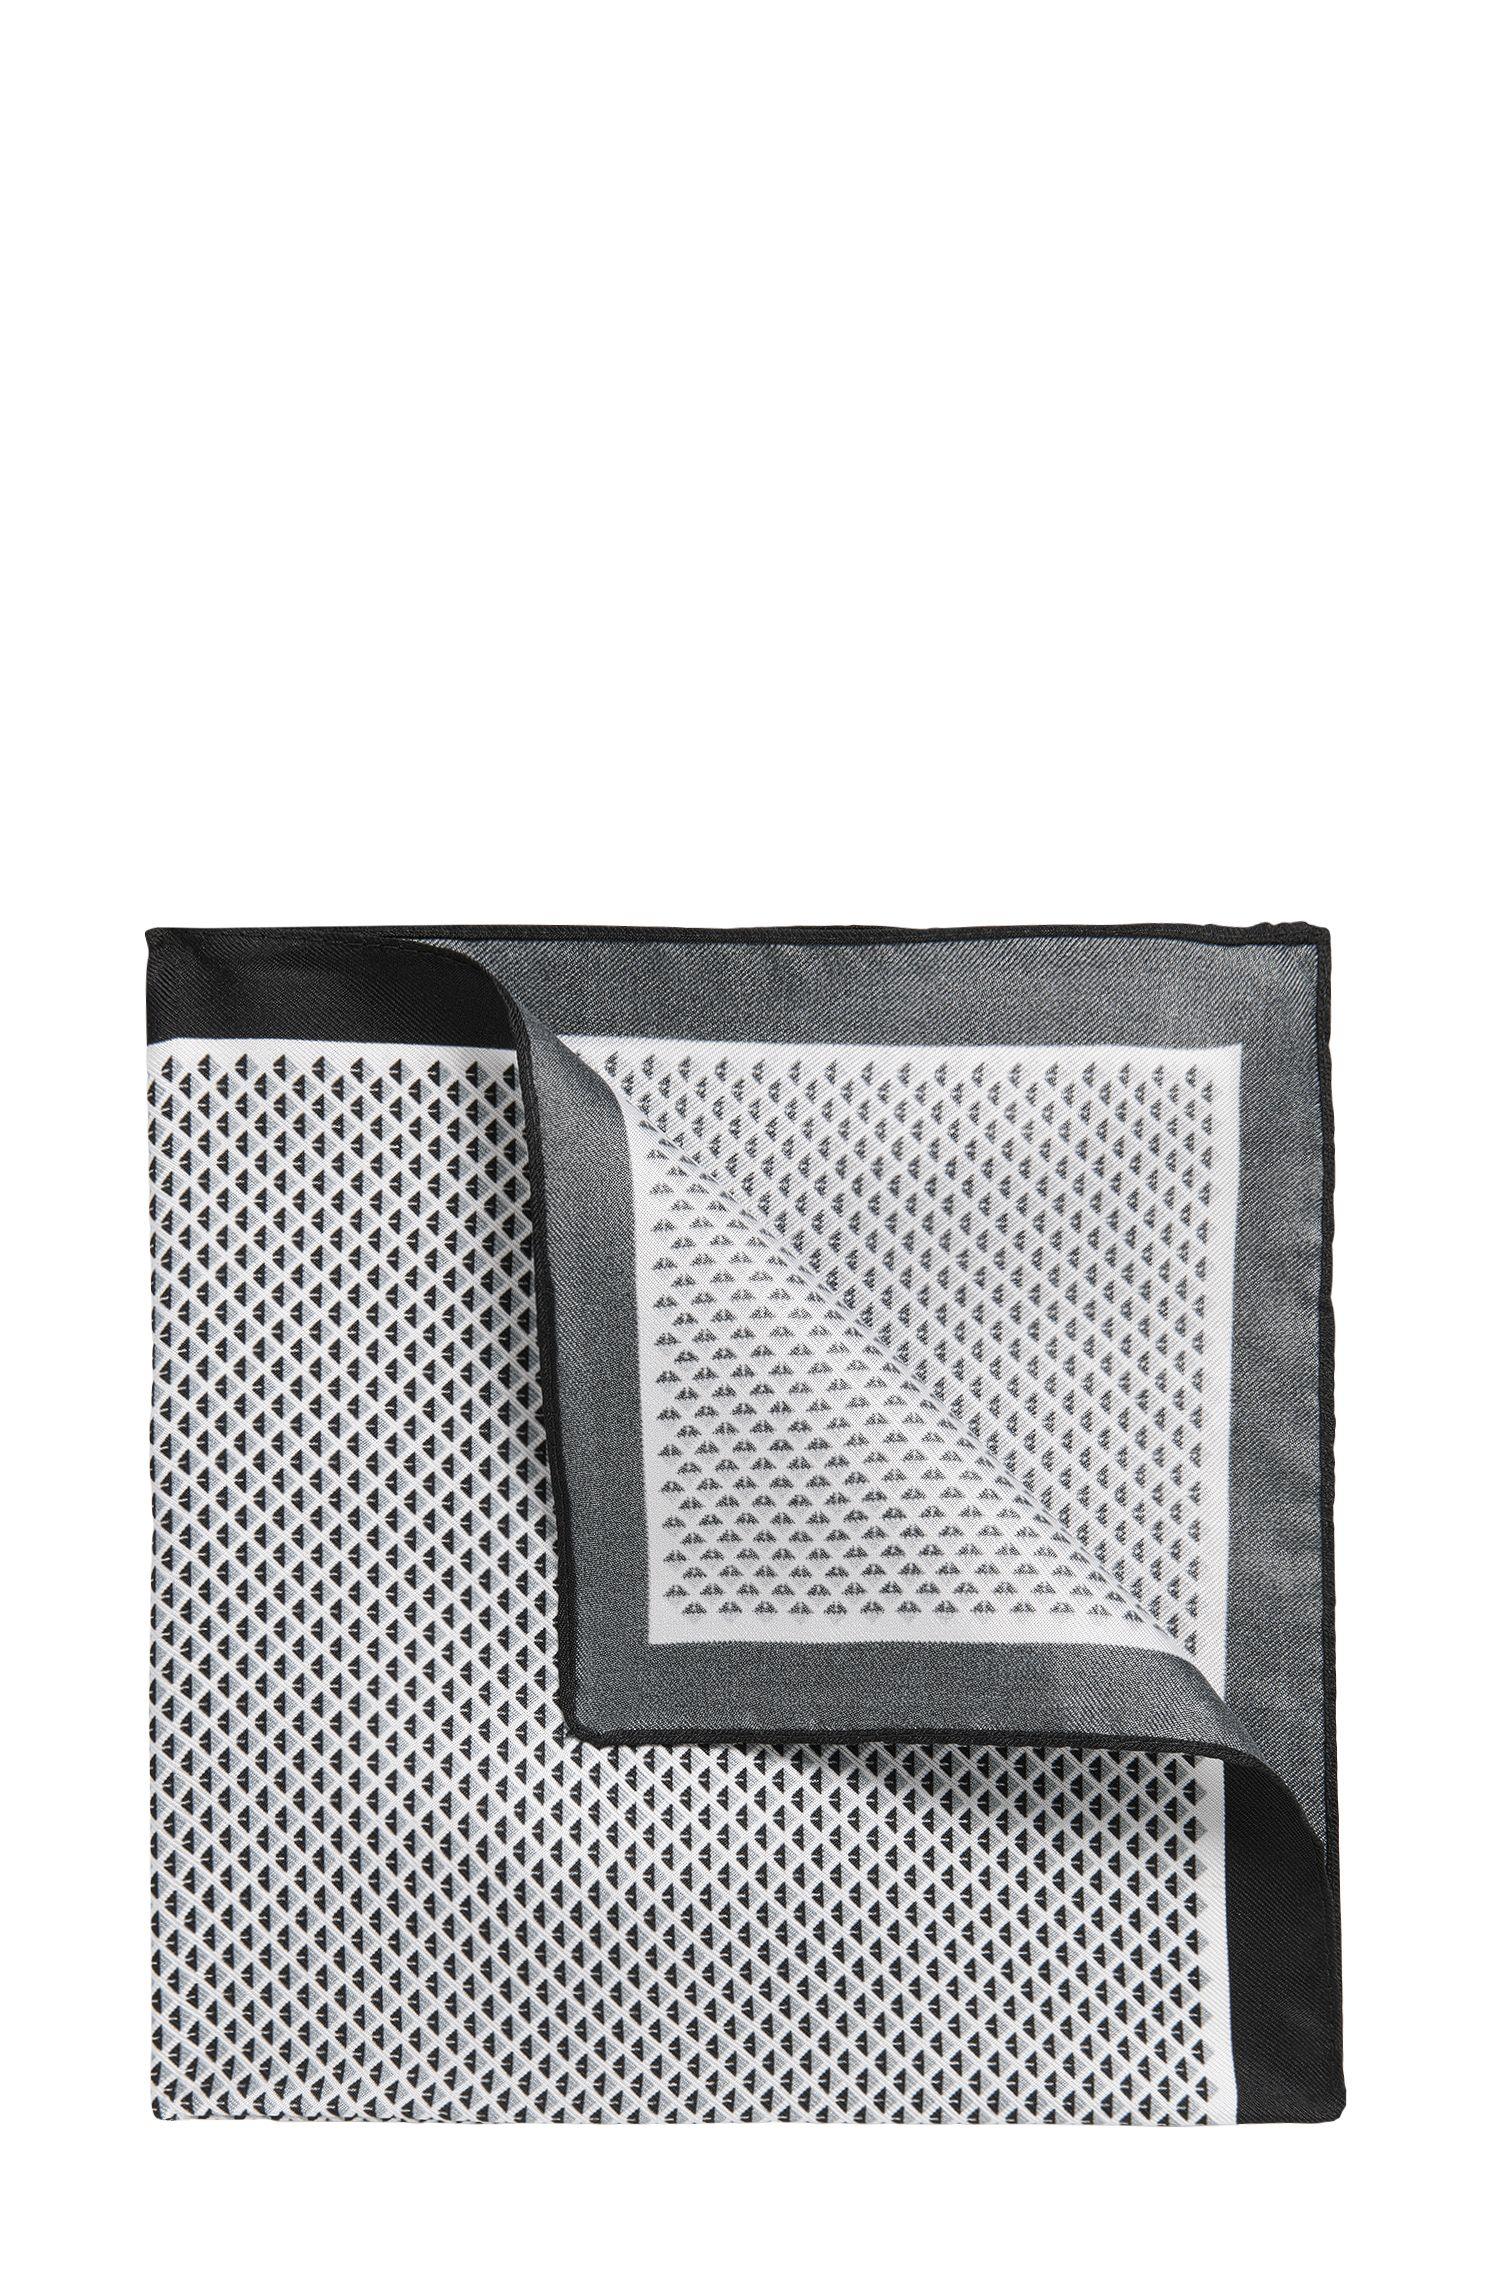 'Pocket sq. cm 33x33' | Micro-Dimond Italian Silk Pocket Square